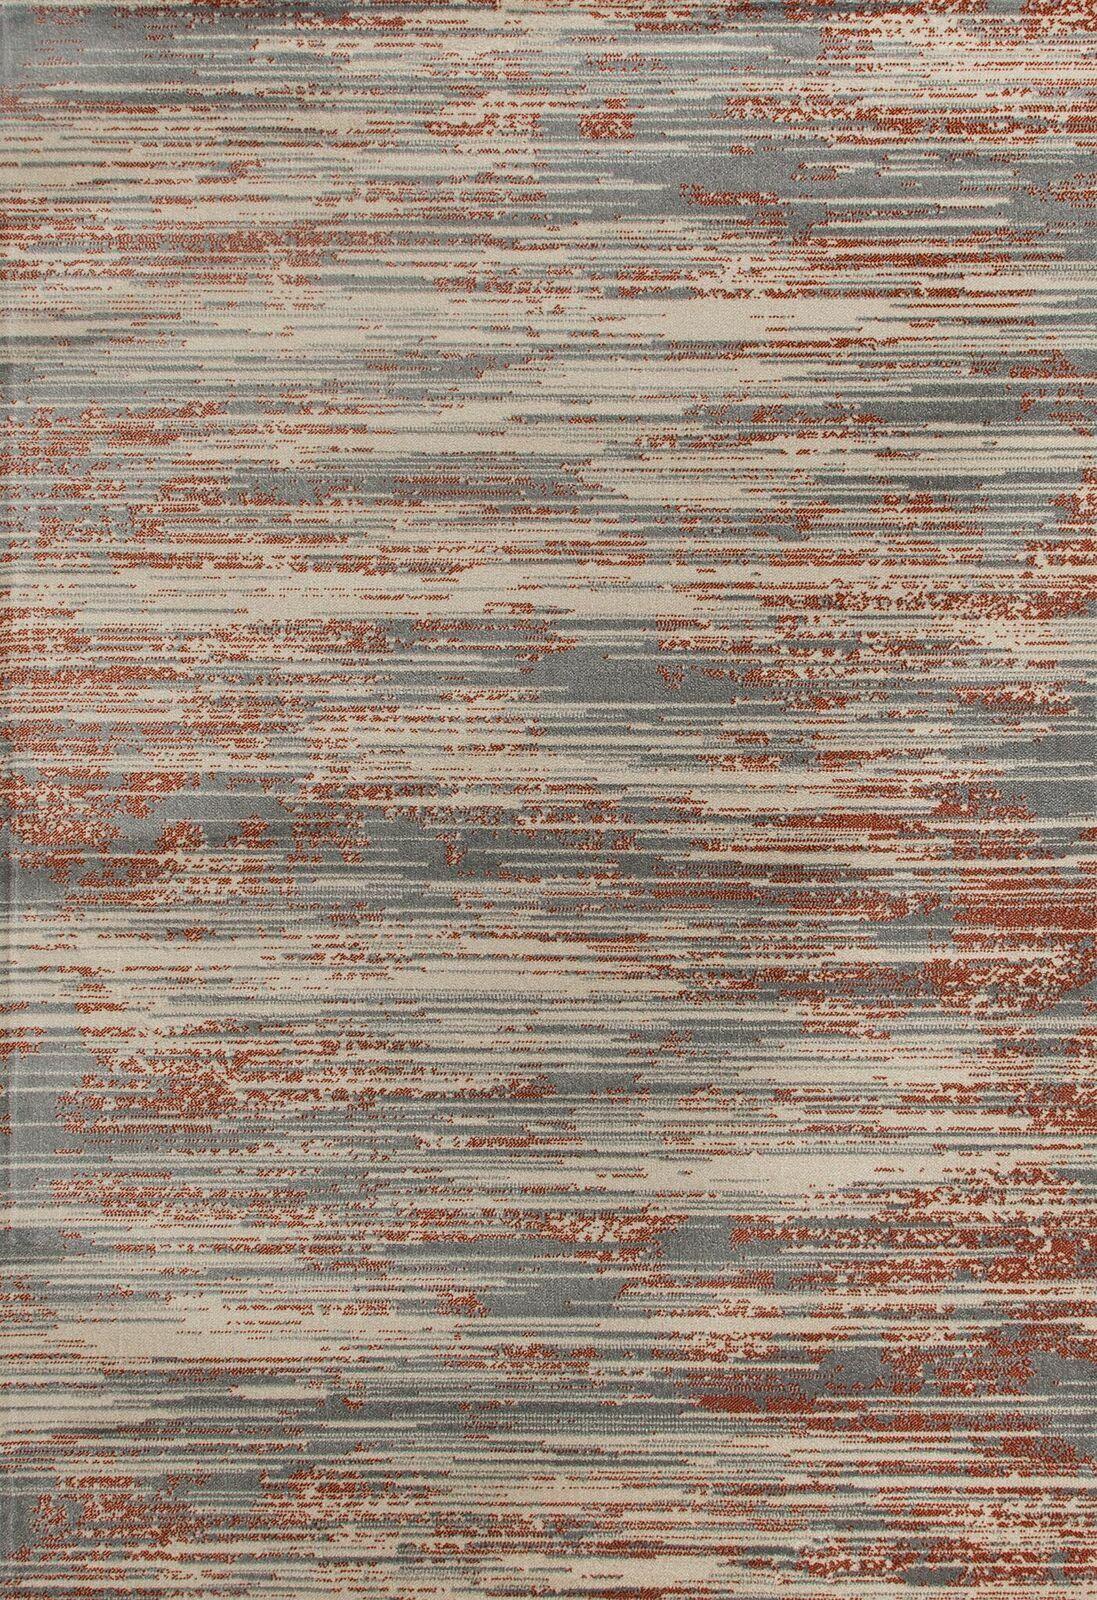 Burgos Gray/Beige Area Rug Rug Size: 7'10 x 10